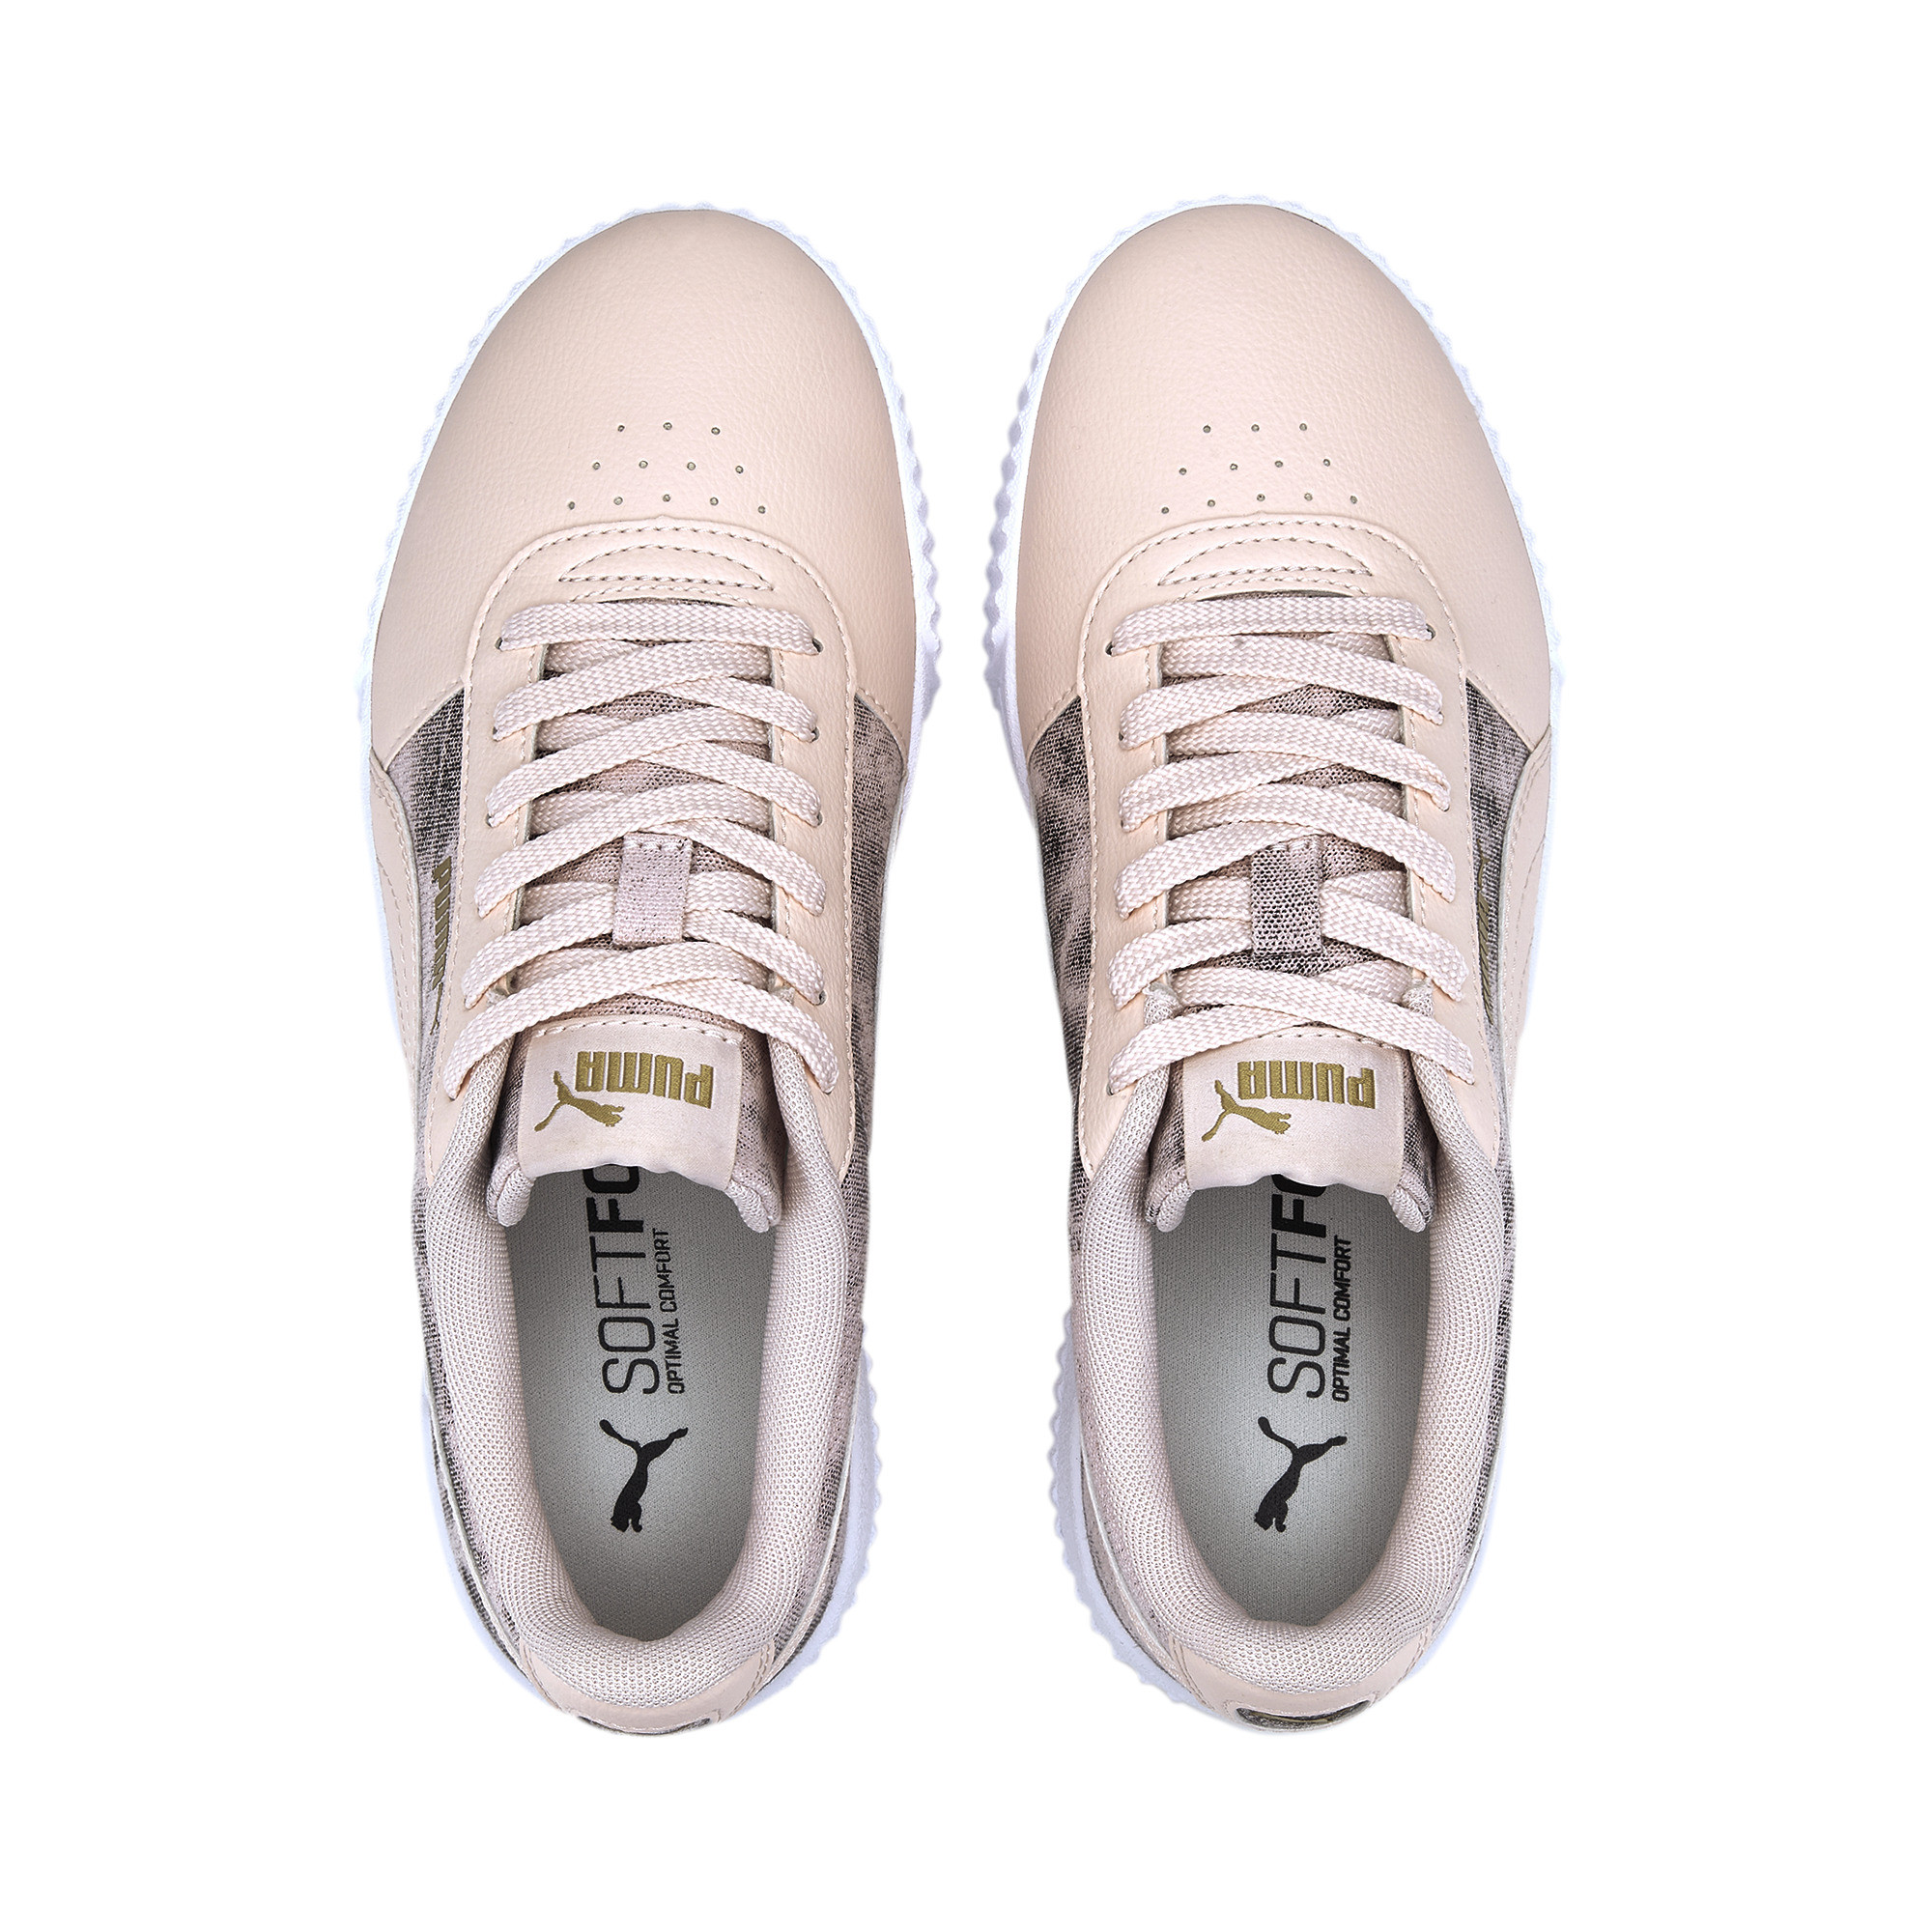 PUMA-Women-039-s-Carina-Tie-Dye-Sneakers thumbnail 8